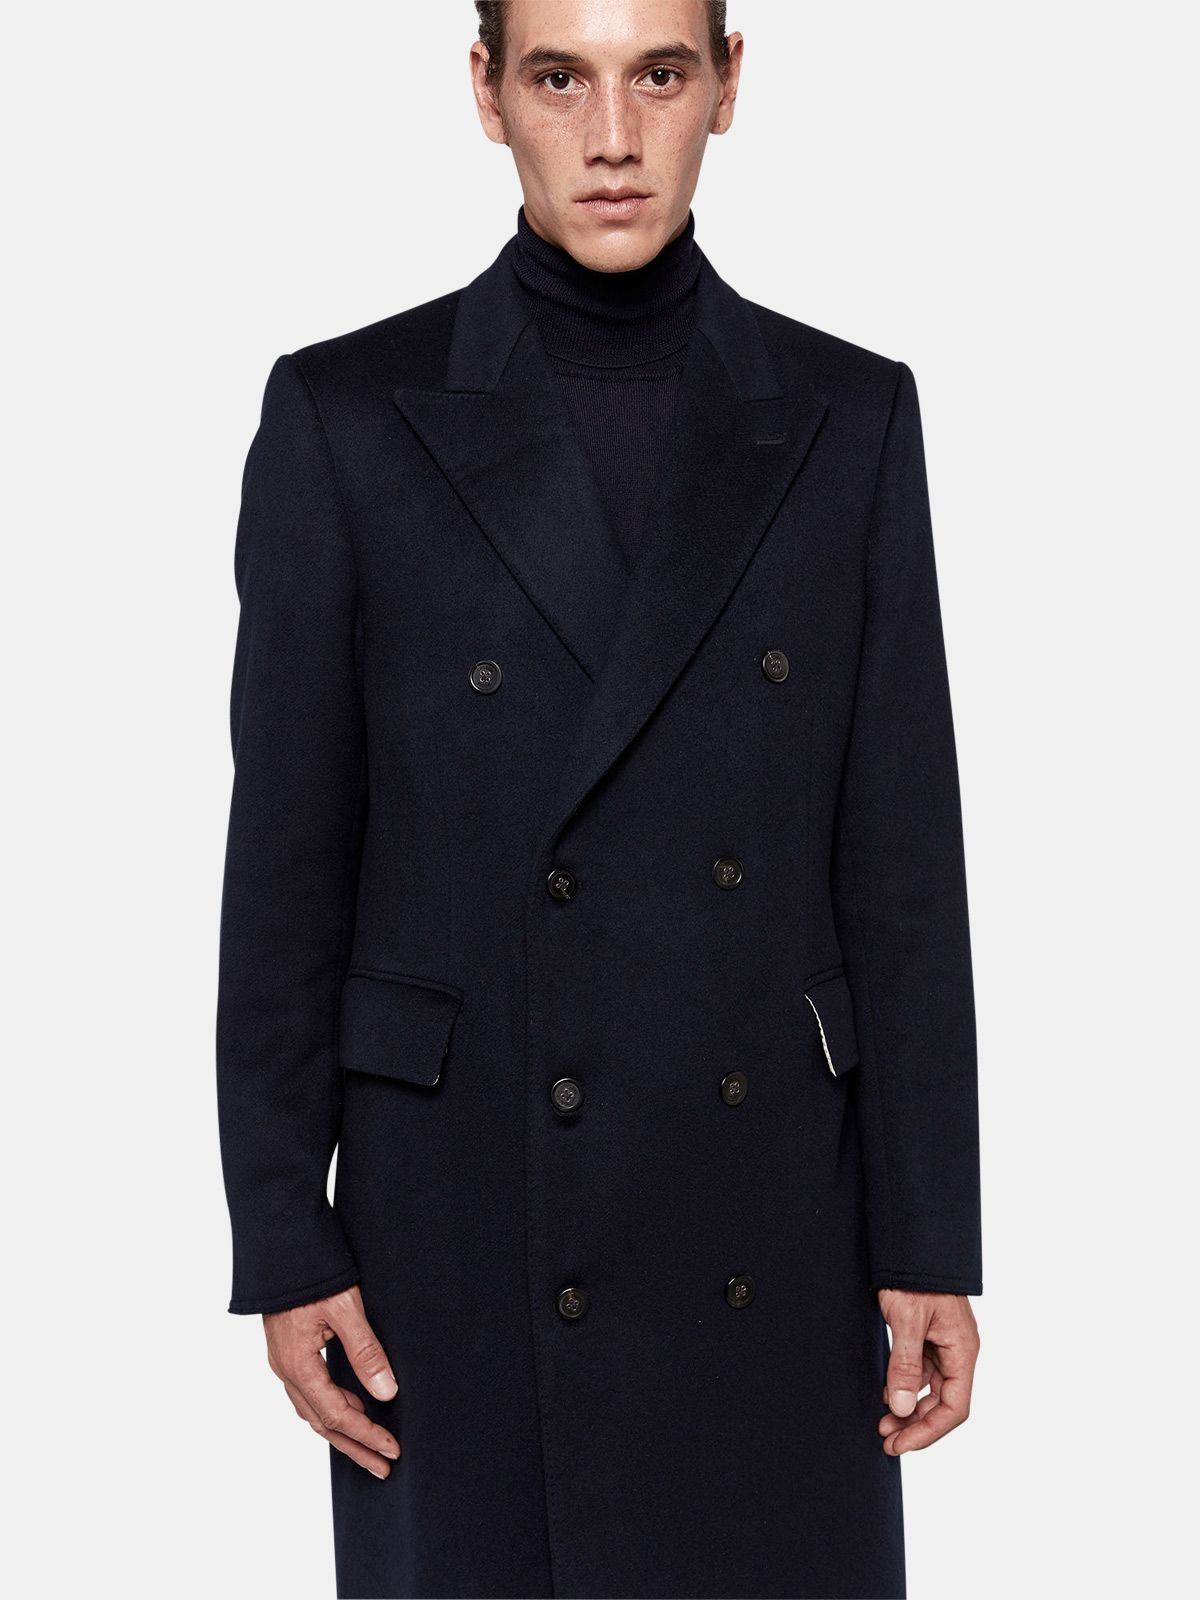 Golden Goose - Yukio double-breasted coat in wool blend  in